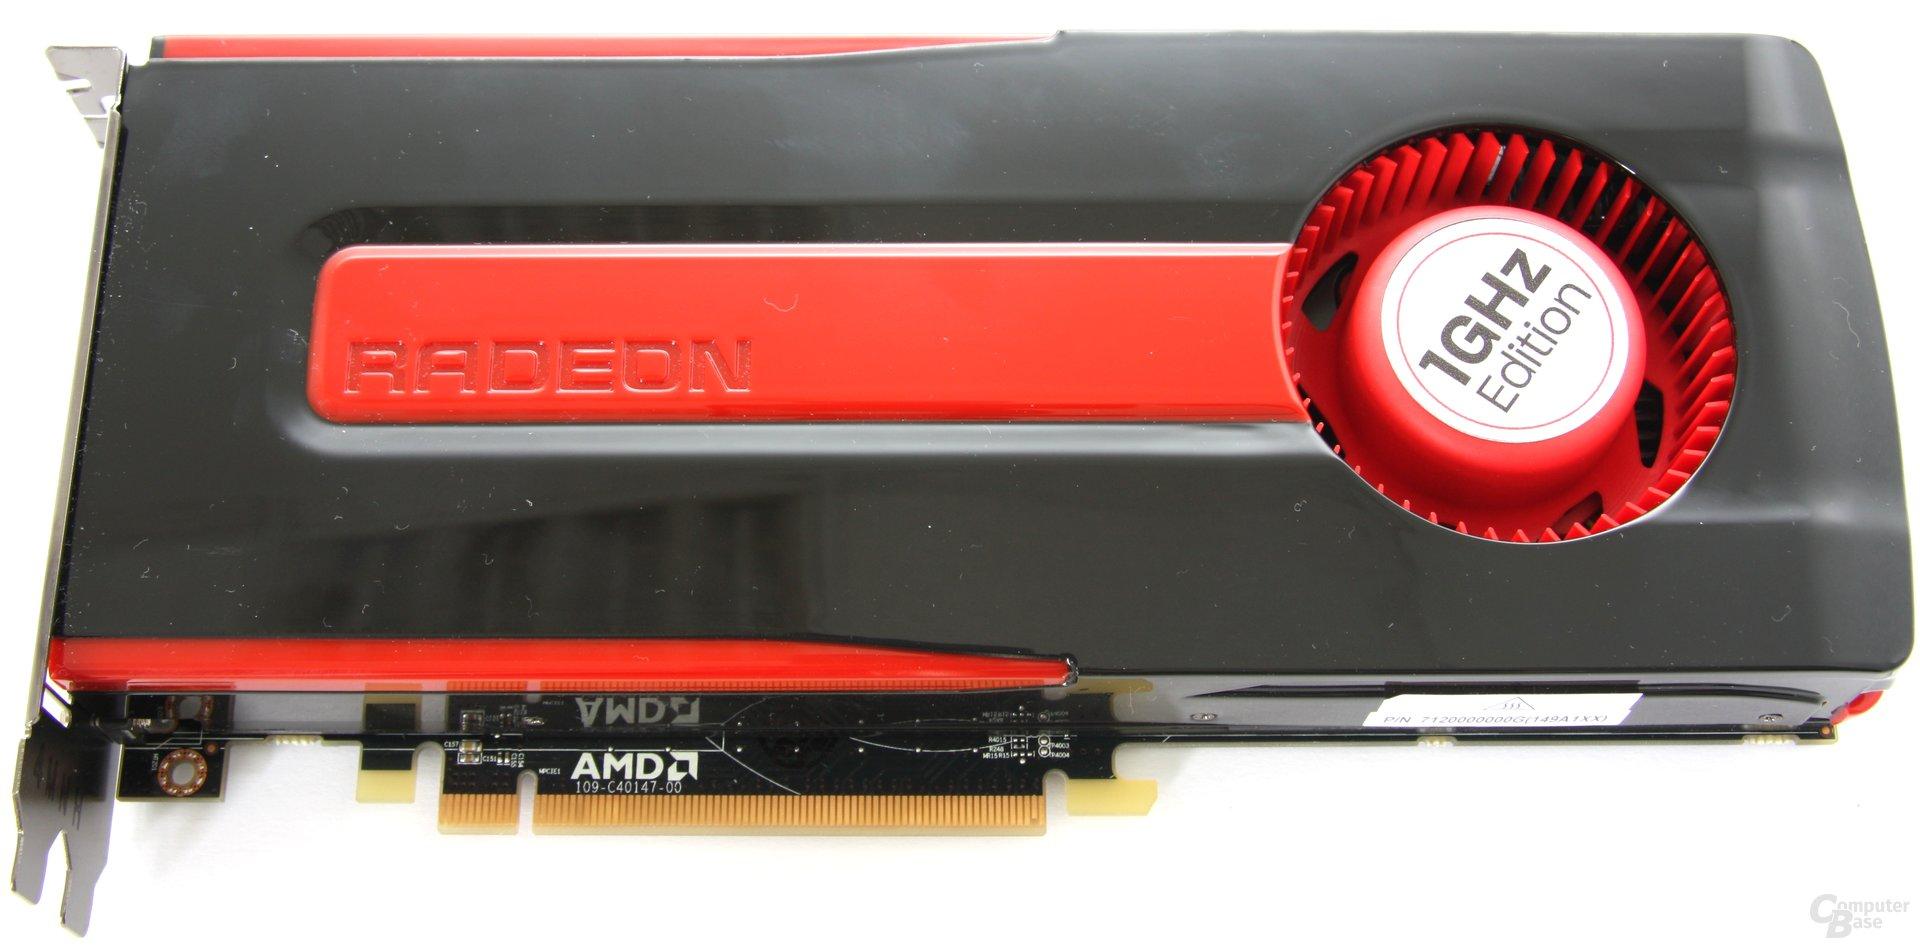 AMD Radeon HD 7870